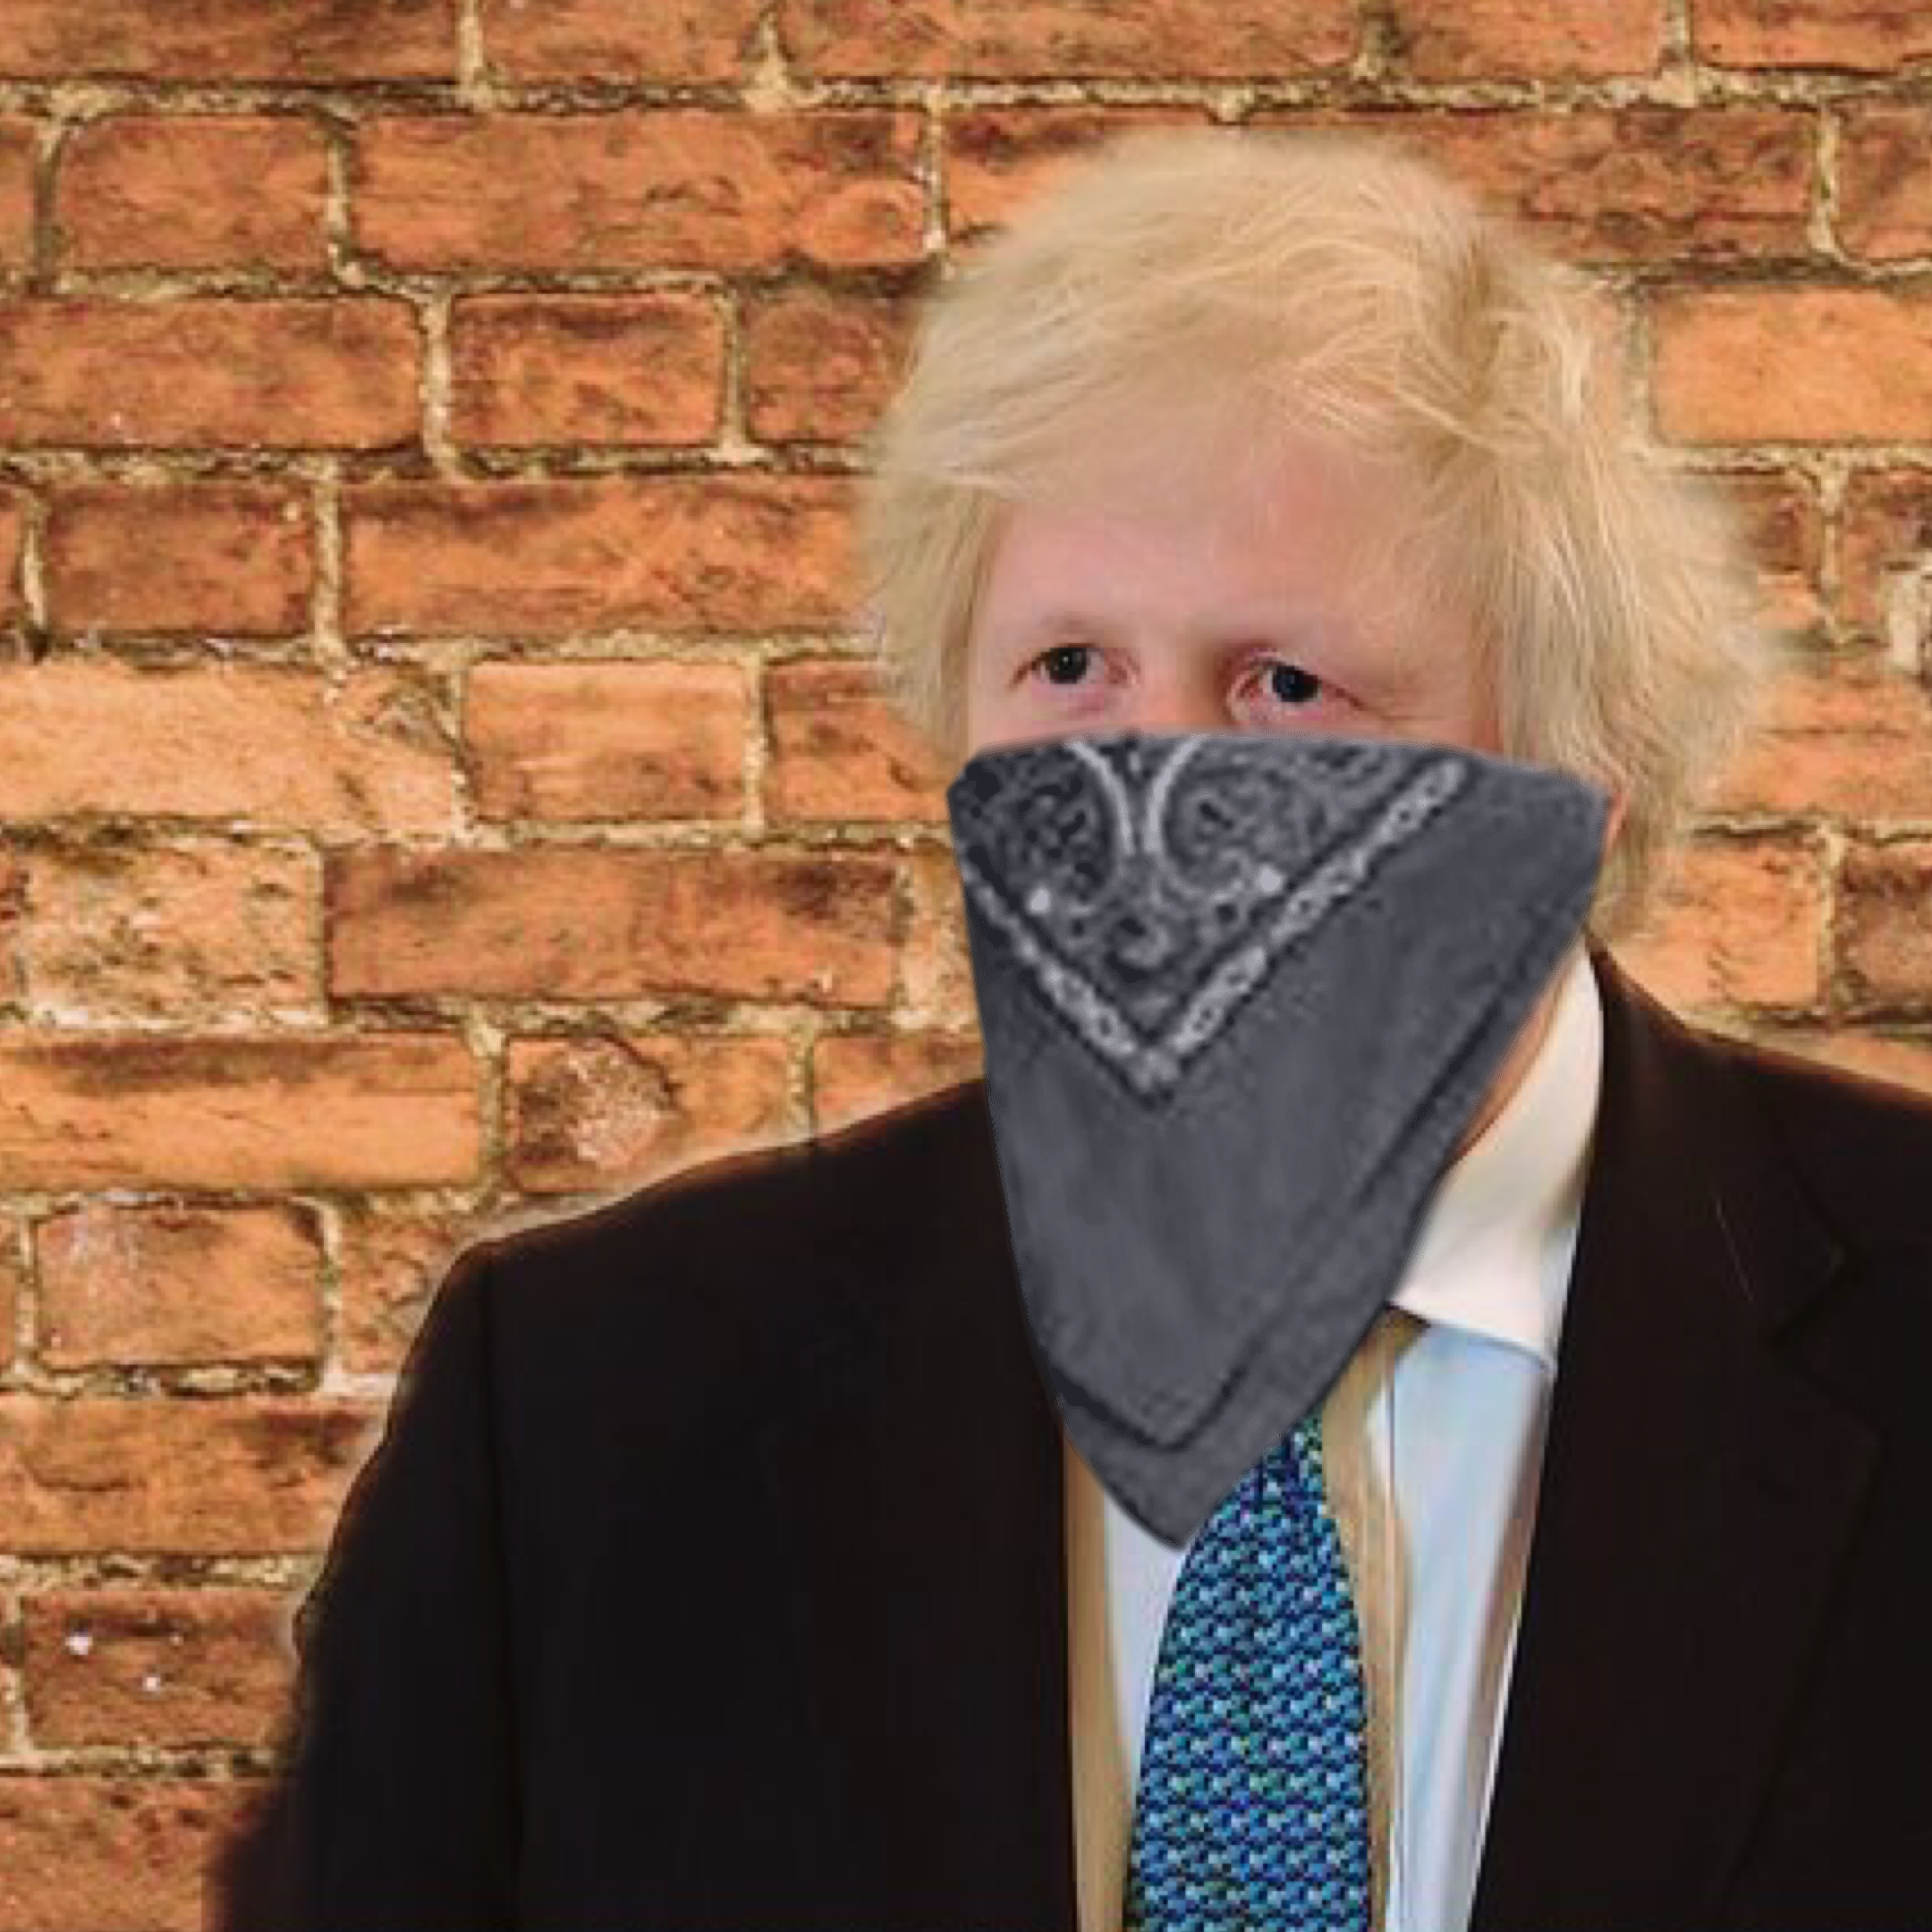 Blond uses a bandana as a face mask